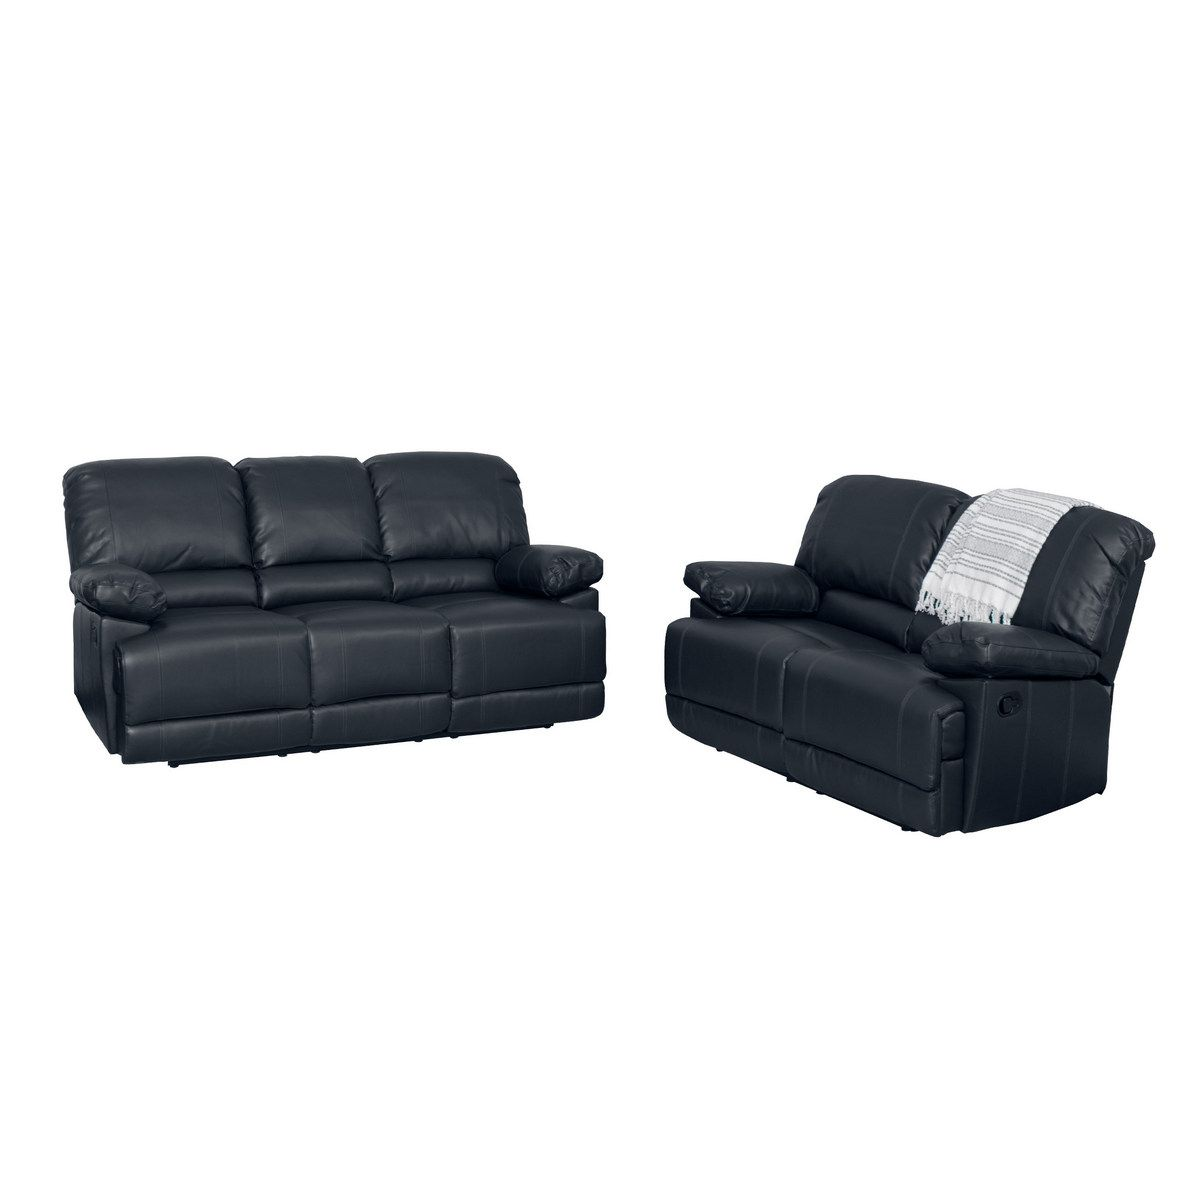 Corliving Lzy 301 Z2 Lea 2pc Black Bonded Leather Reclining Sofa Set Leather Sofa Set Leather Reclining Sofa Sofa And Loveseat Set